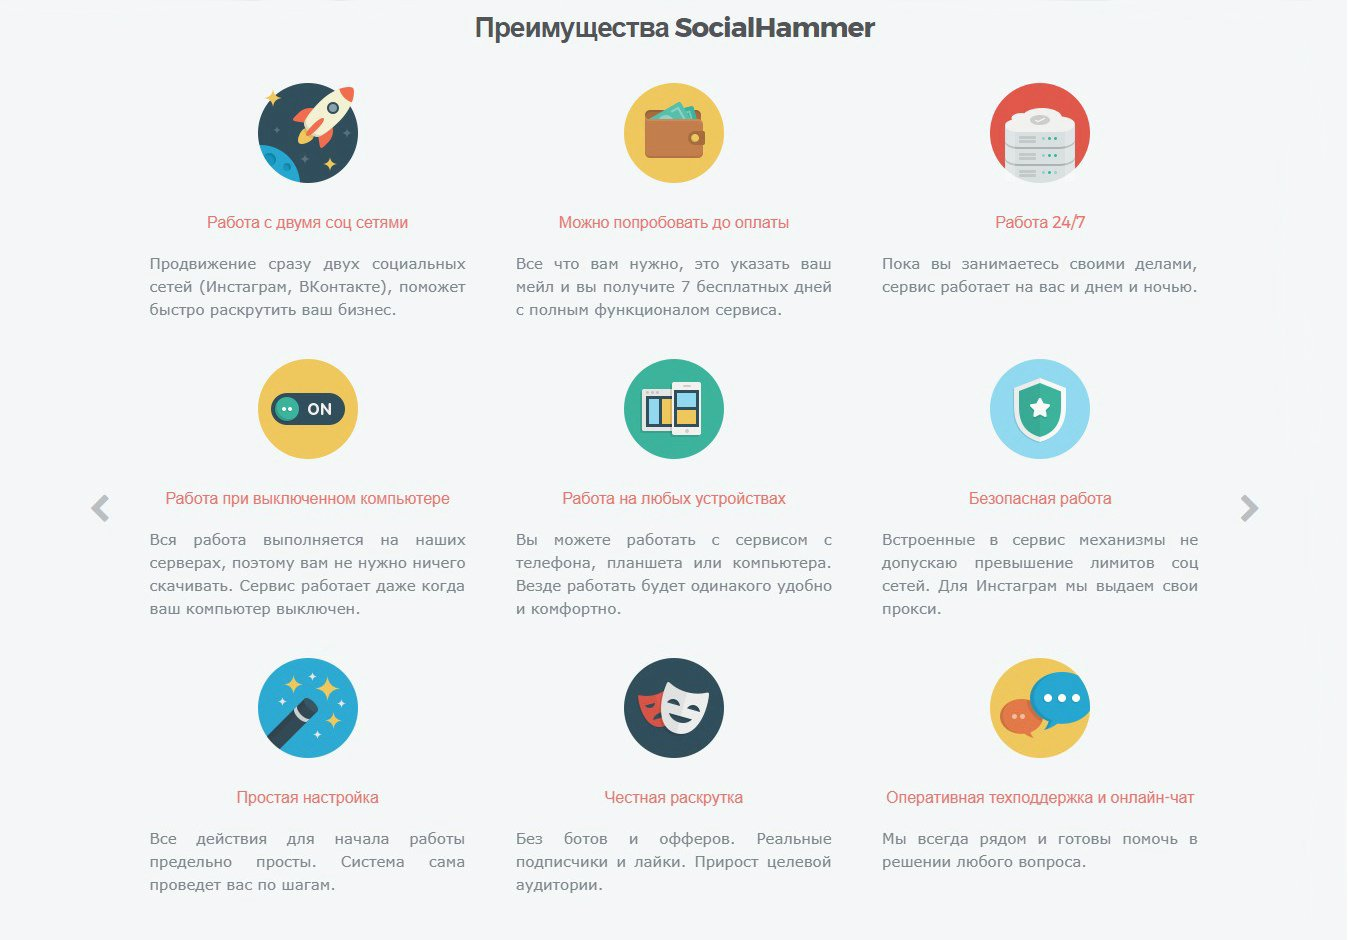 Преимущества SocialHammer